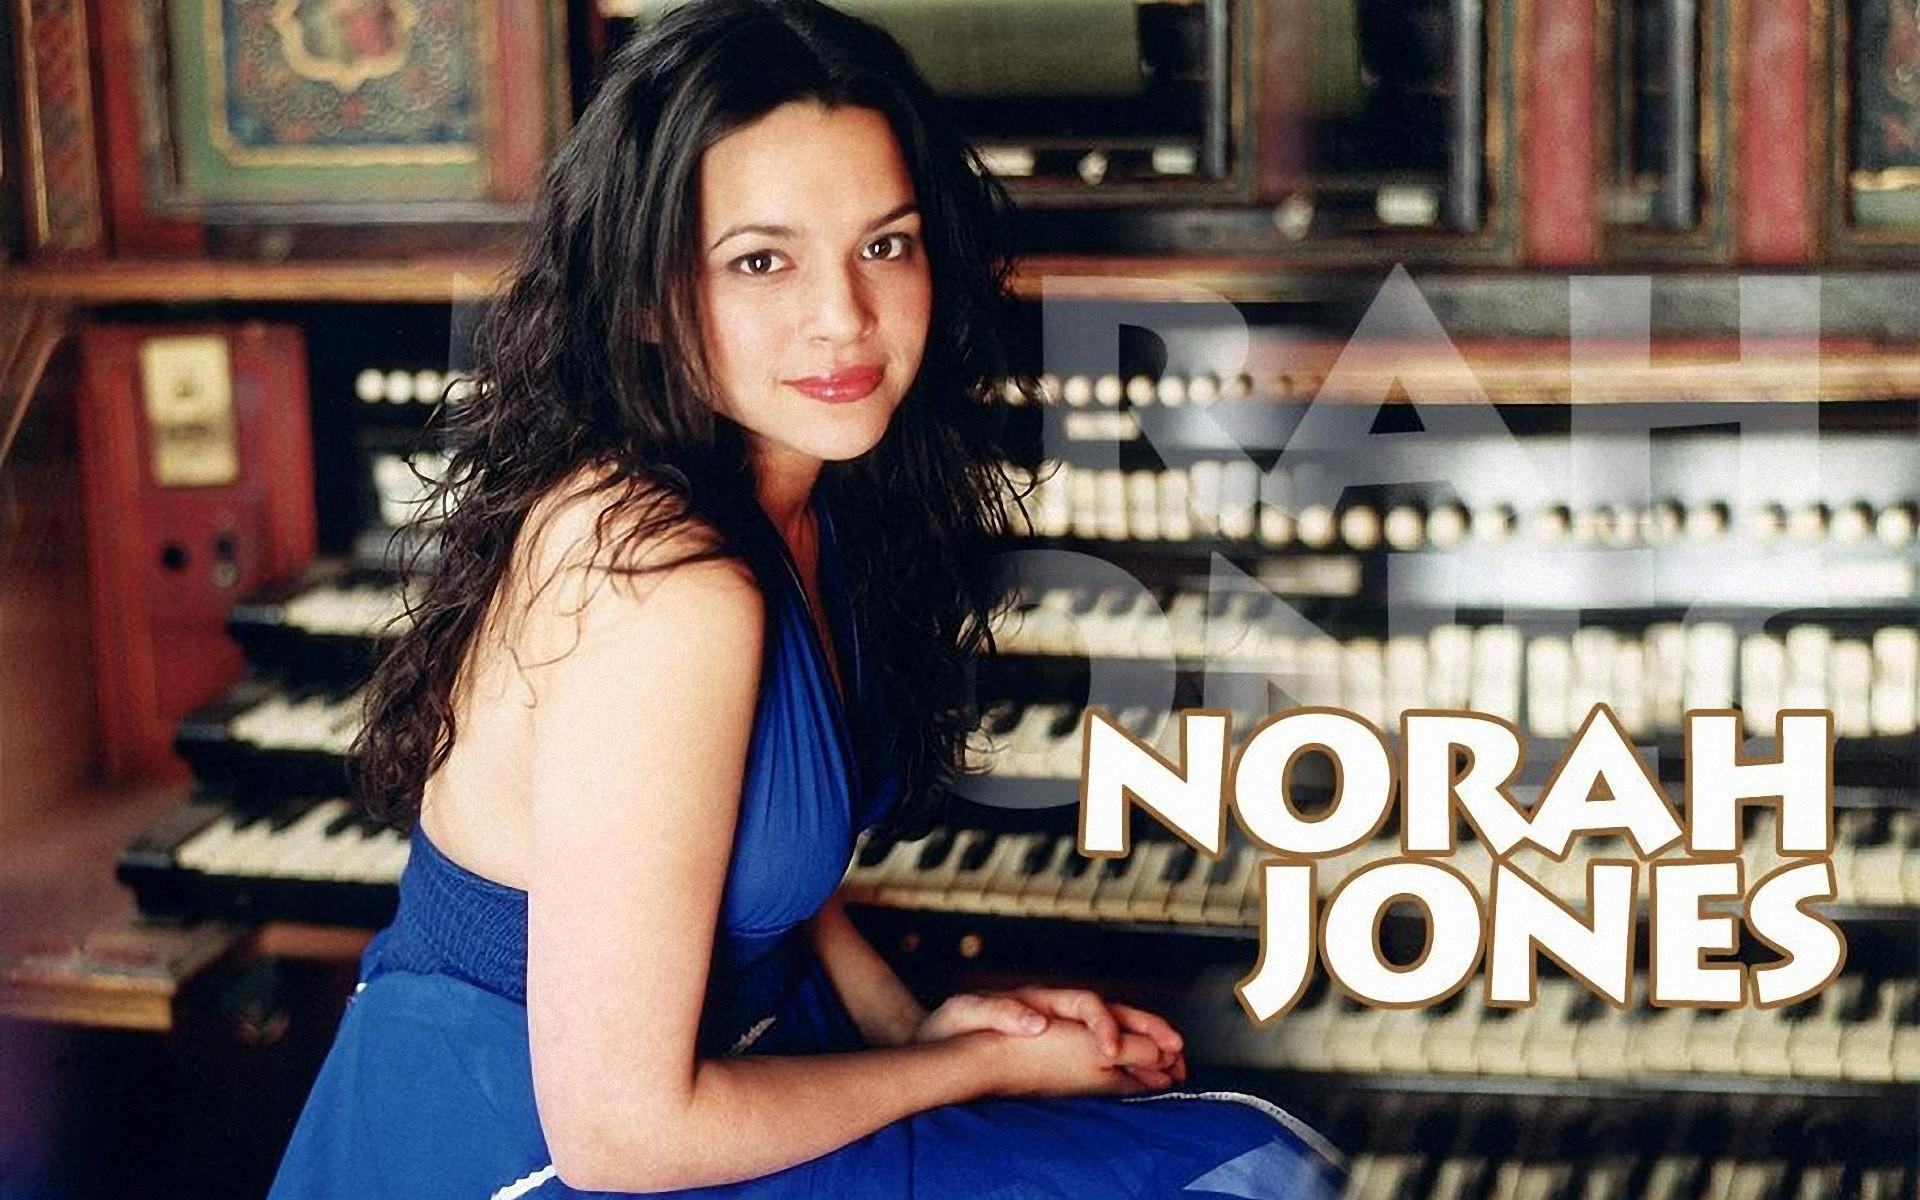 Norah Jones Hd Wallpaper